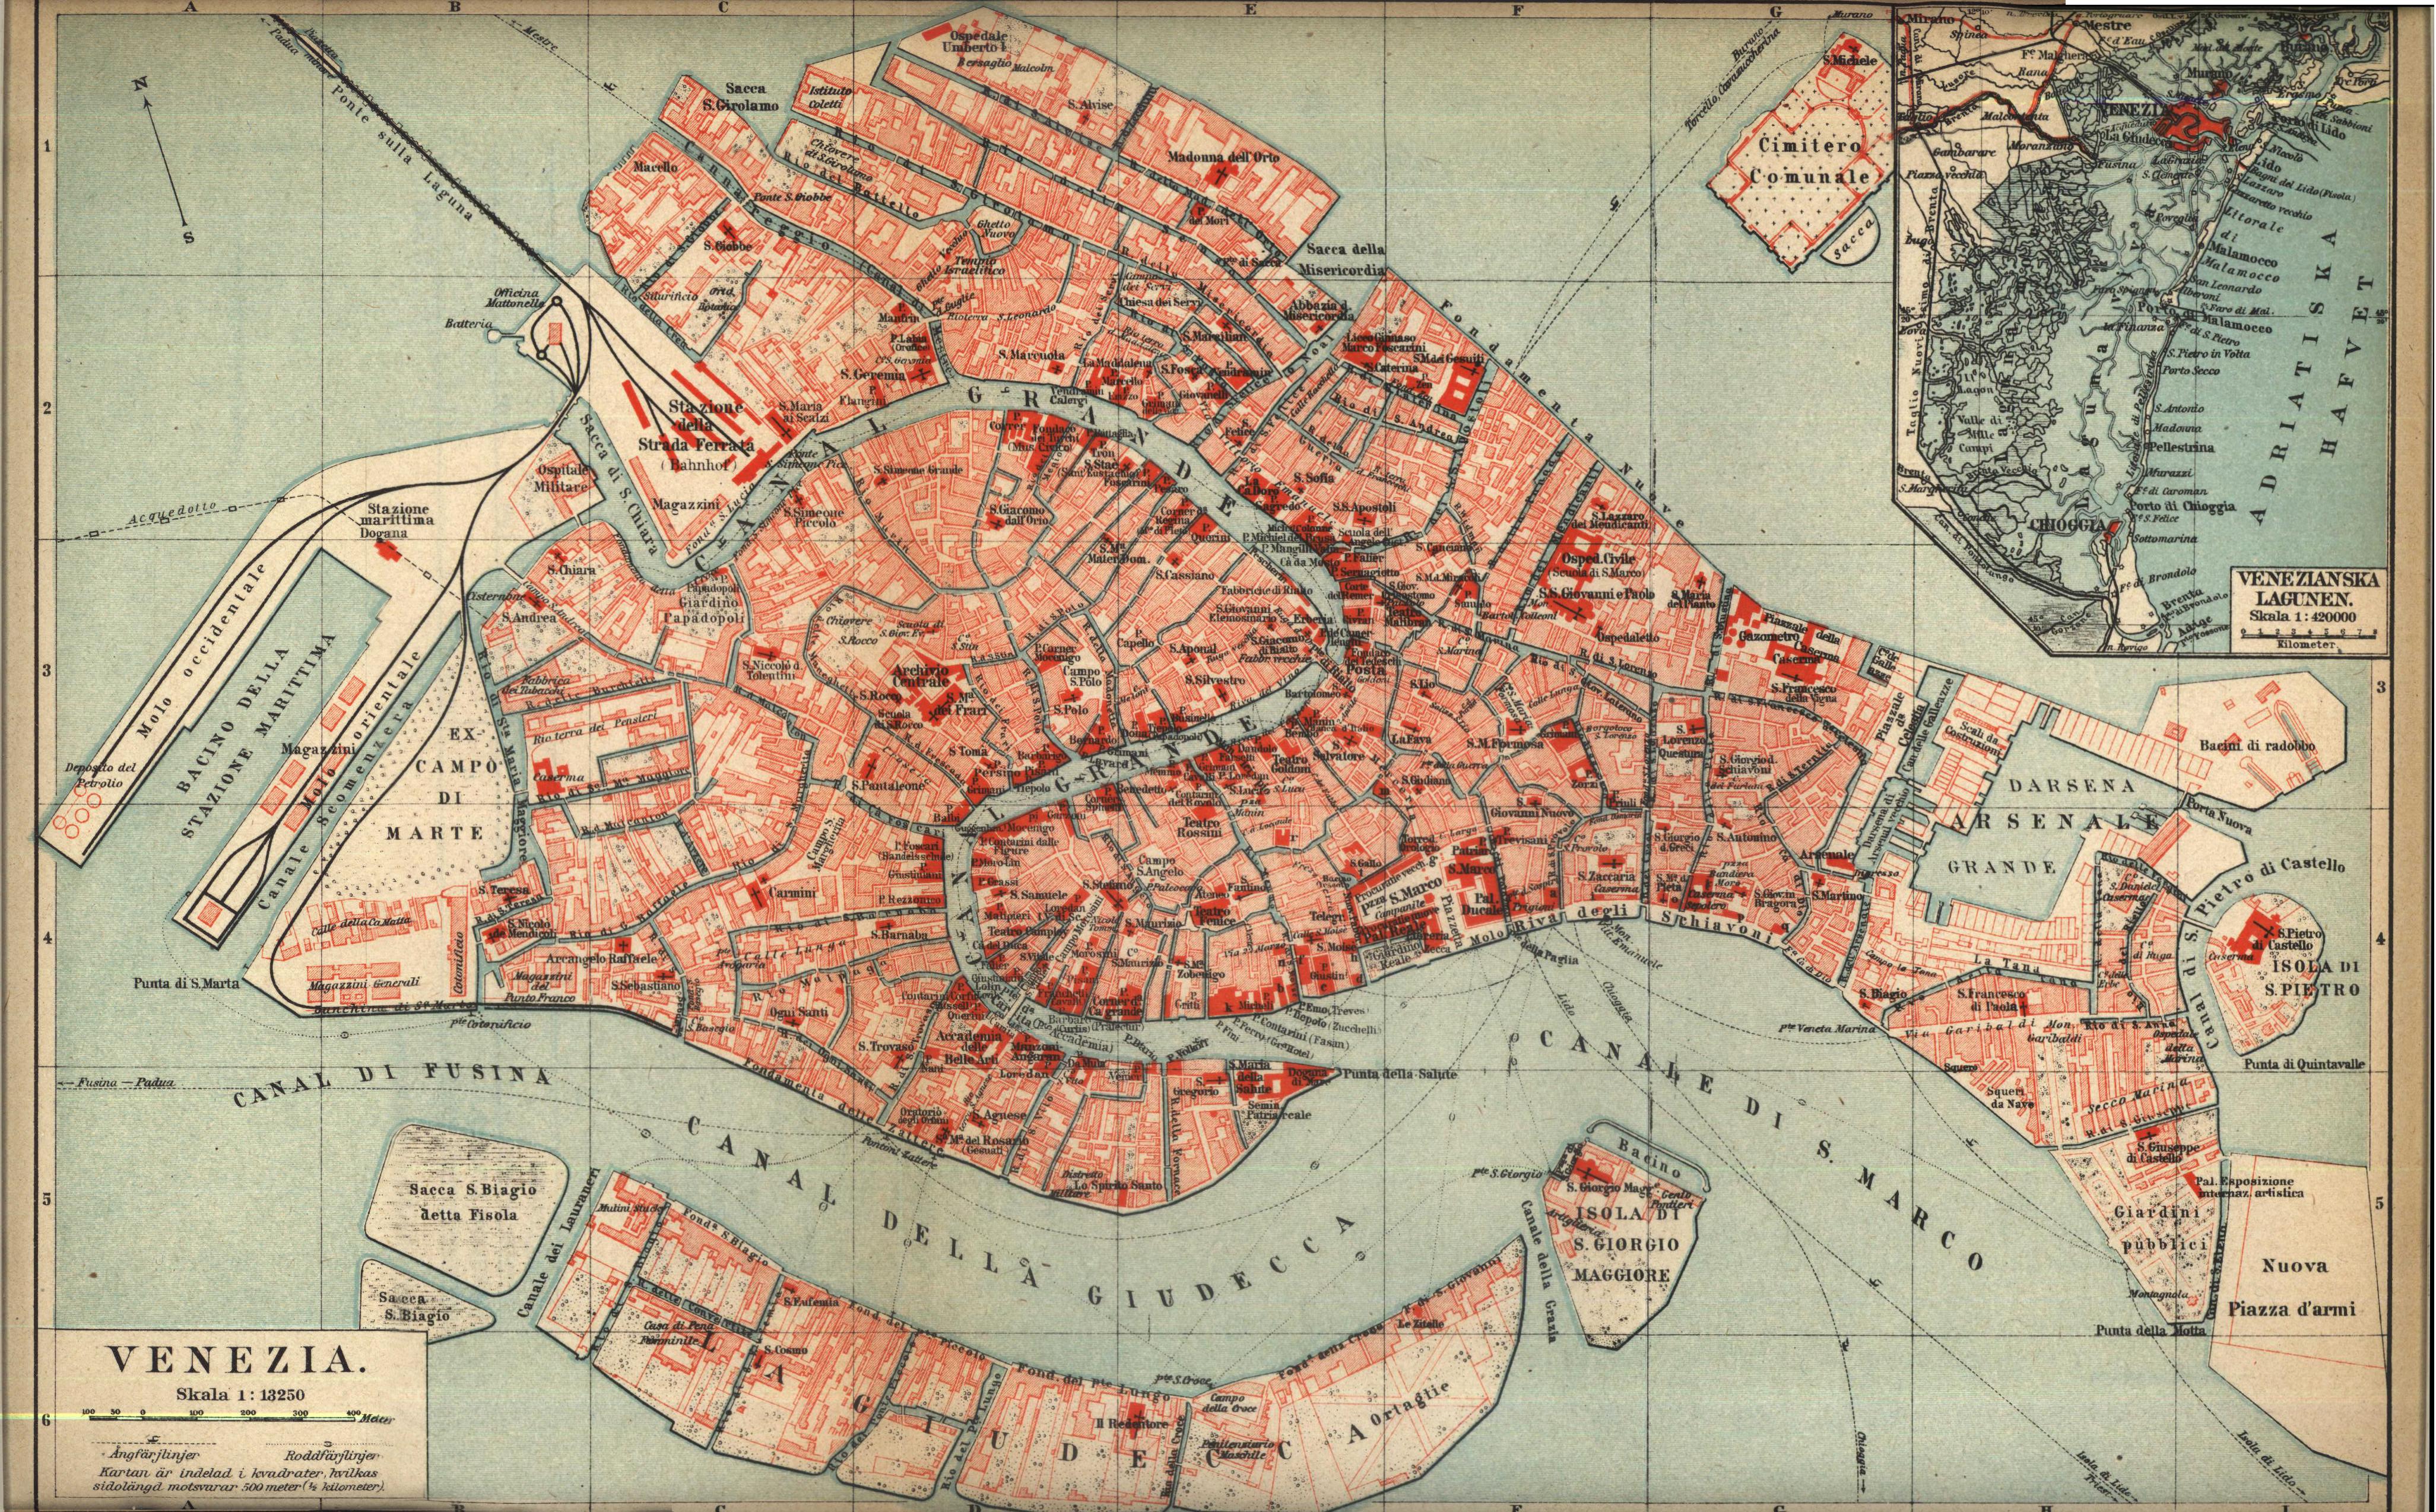 karta över venedig italien Venedig   Wikiwand karta över venedig italien